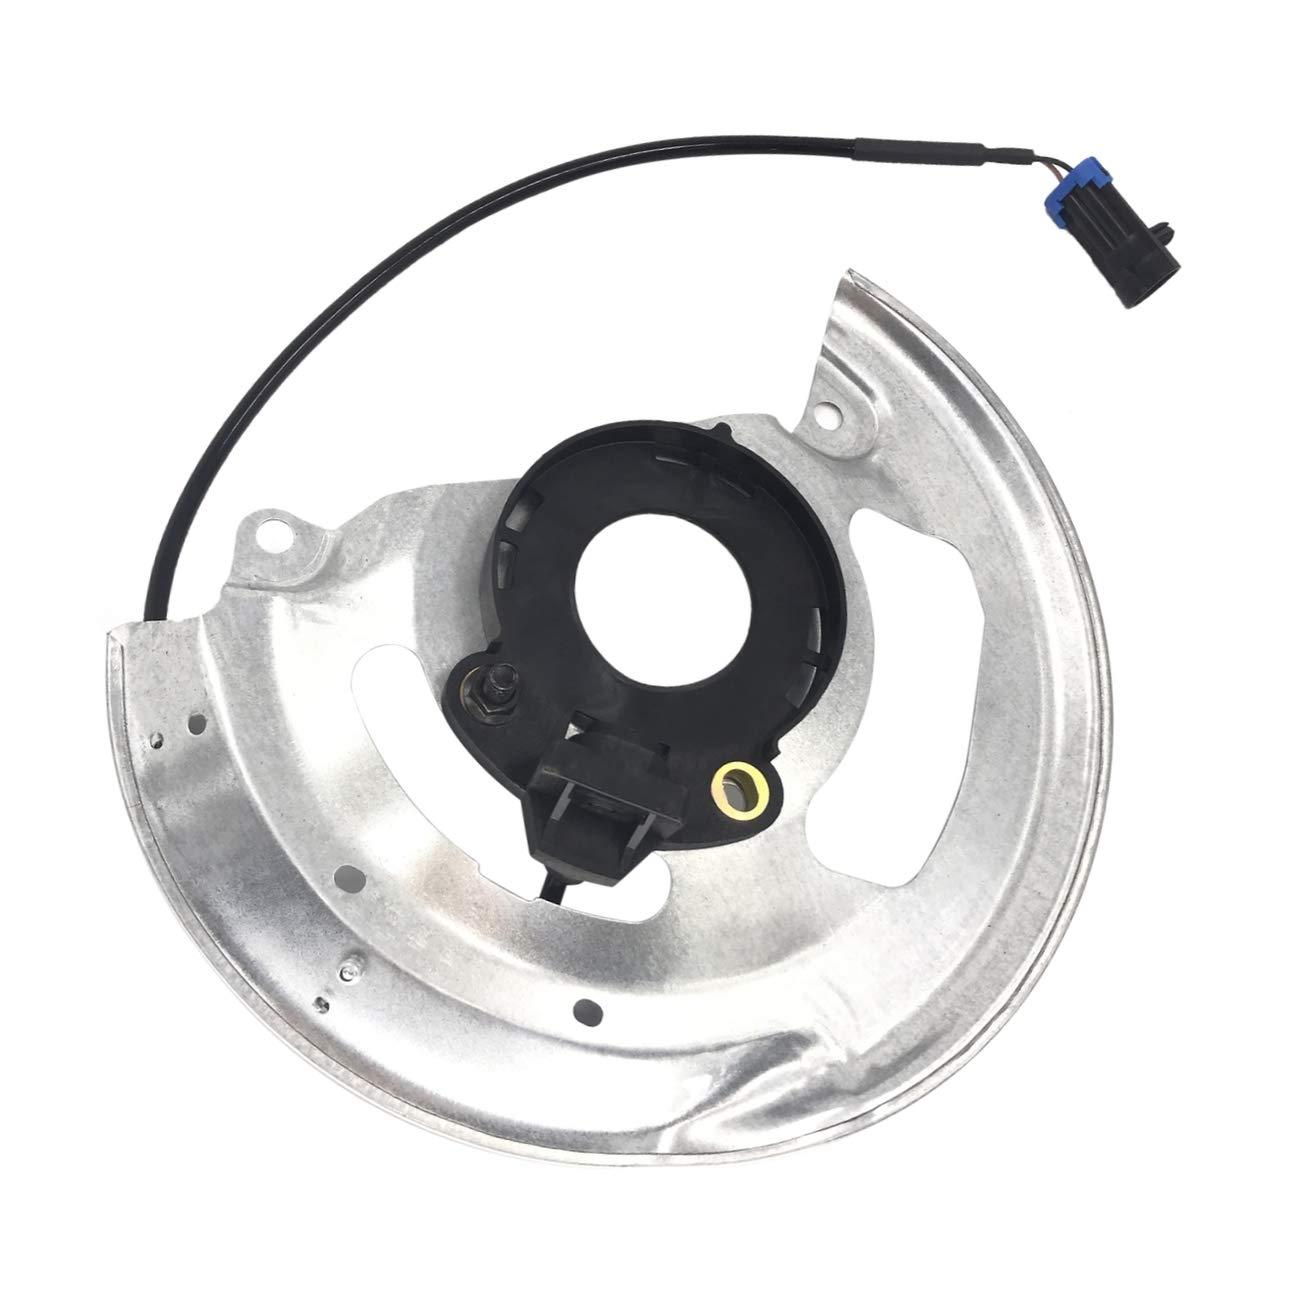 SKP SK970097 OE Replacement ABS Wheel Speed Sensor